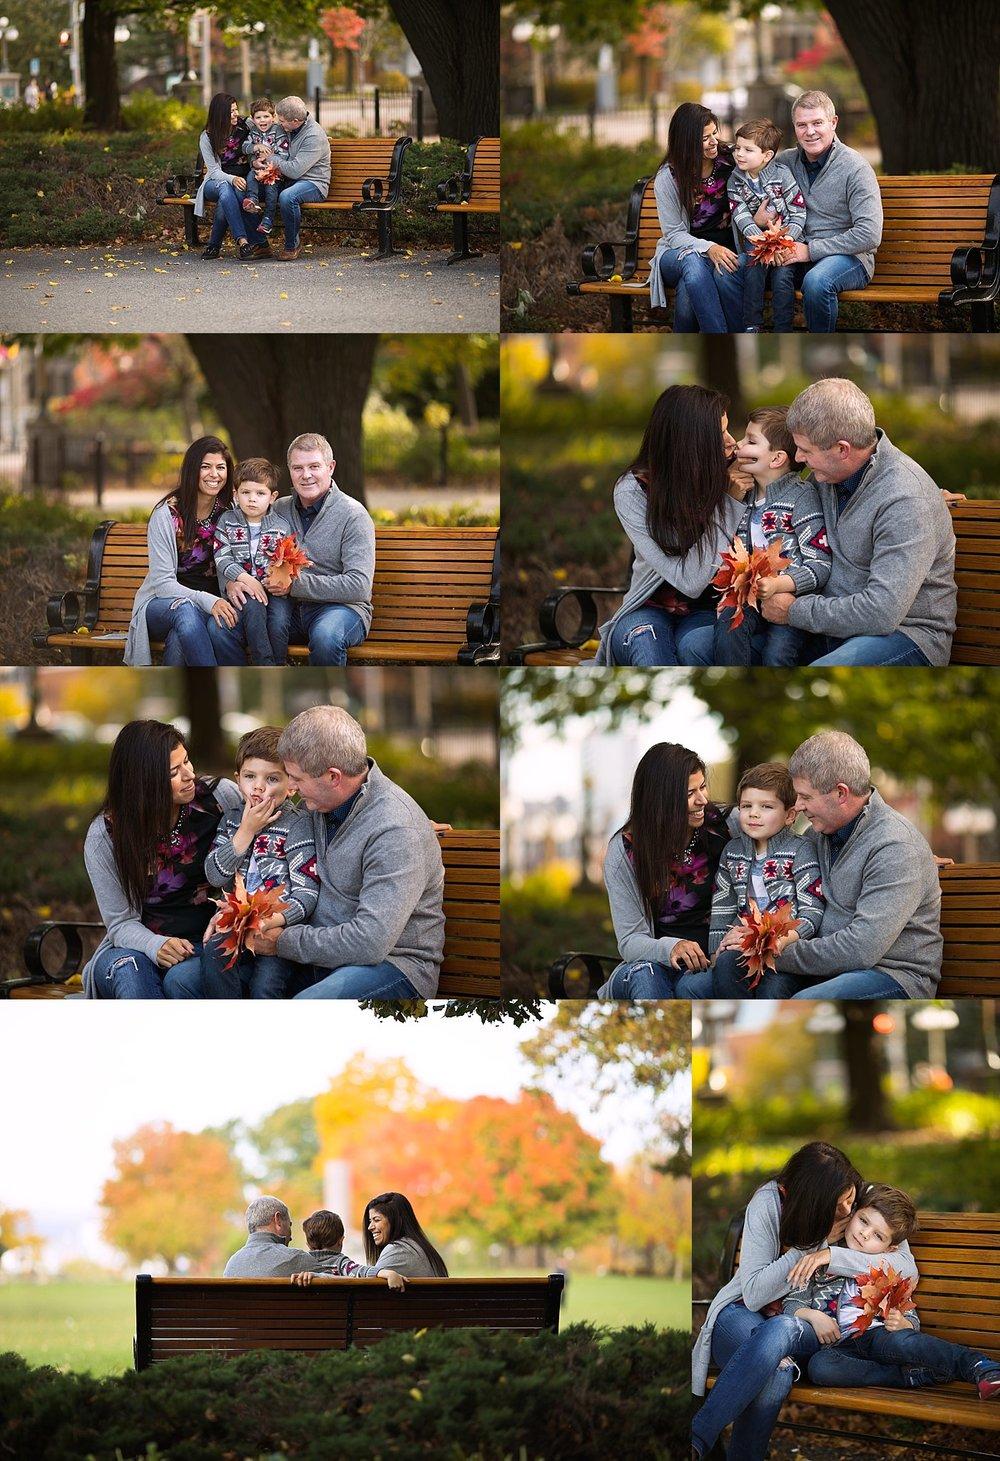 cityscape family photos